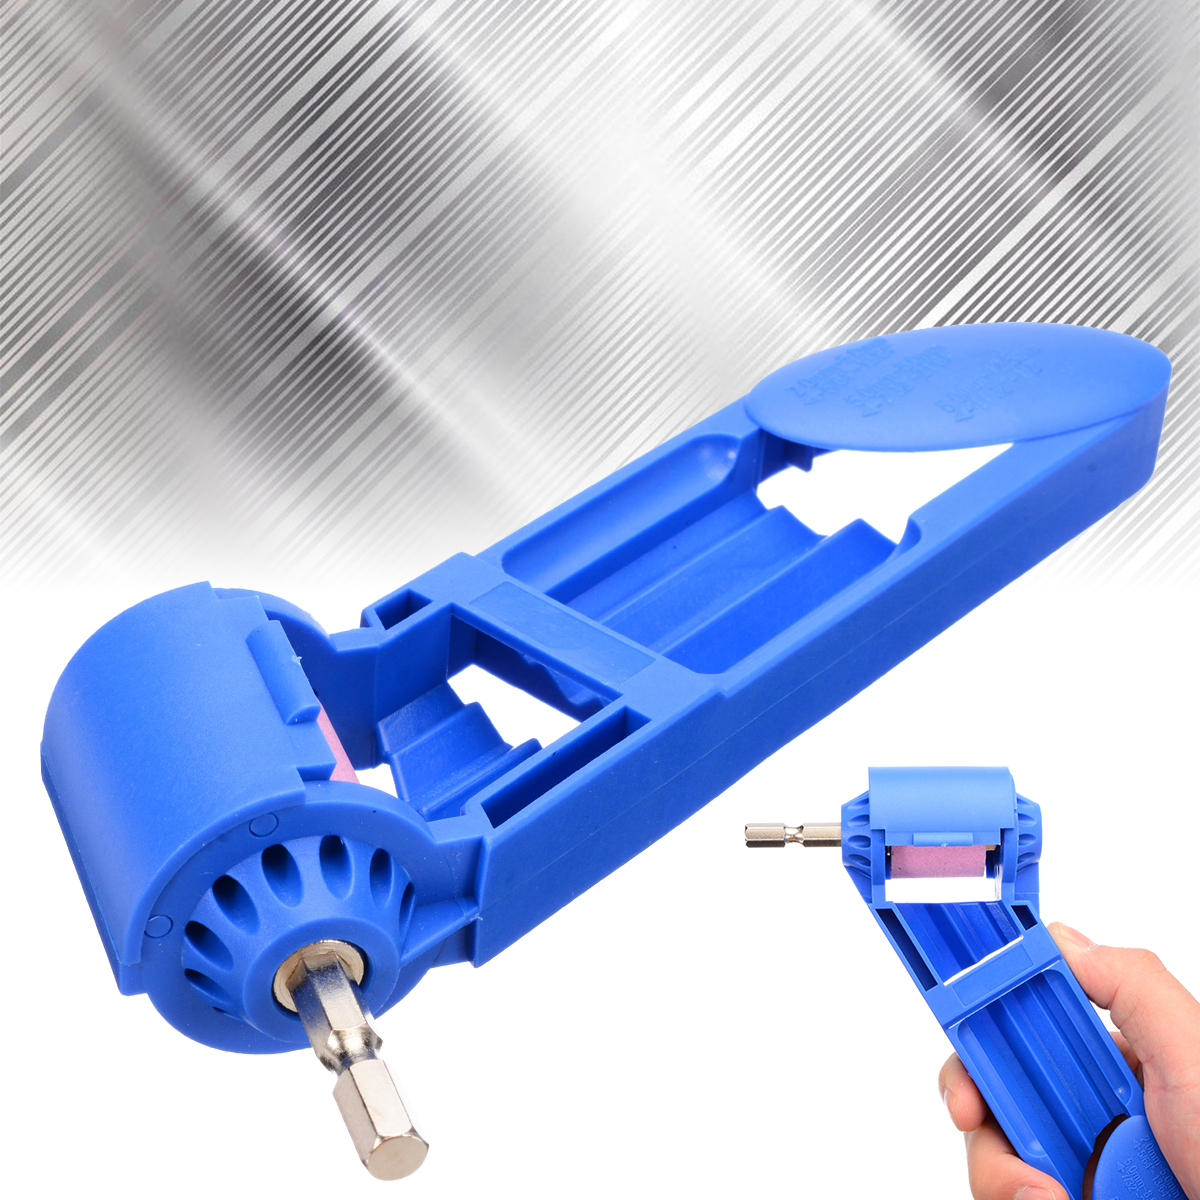 Portable Drill Bit Grinder 185*40mm Corundum Grinding Wheel Drill Bit Sharpener Titanium Drill Powered Polishing Tool